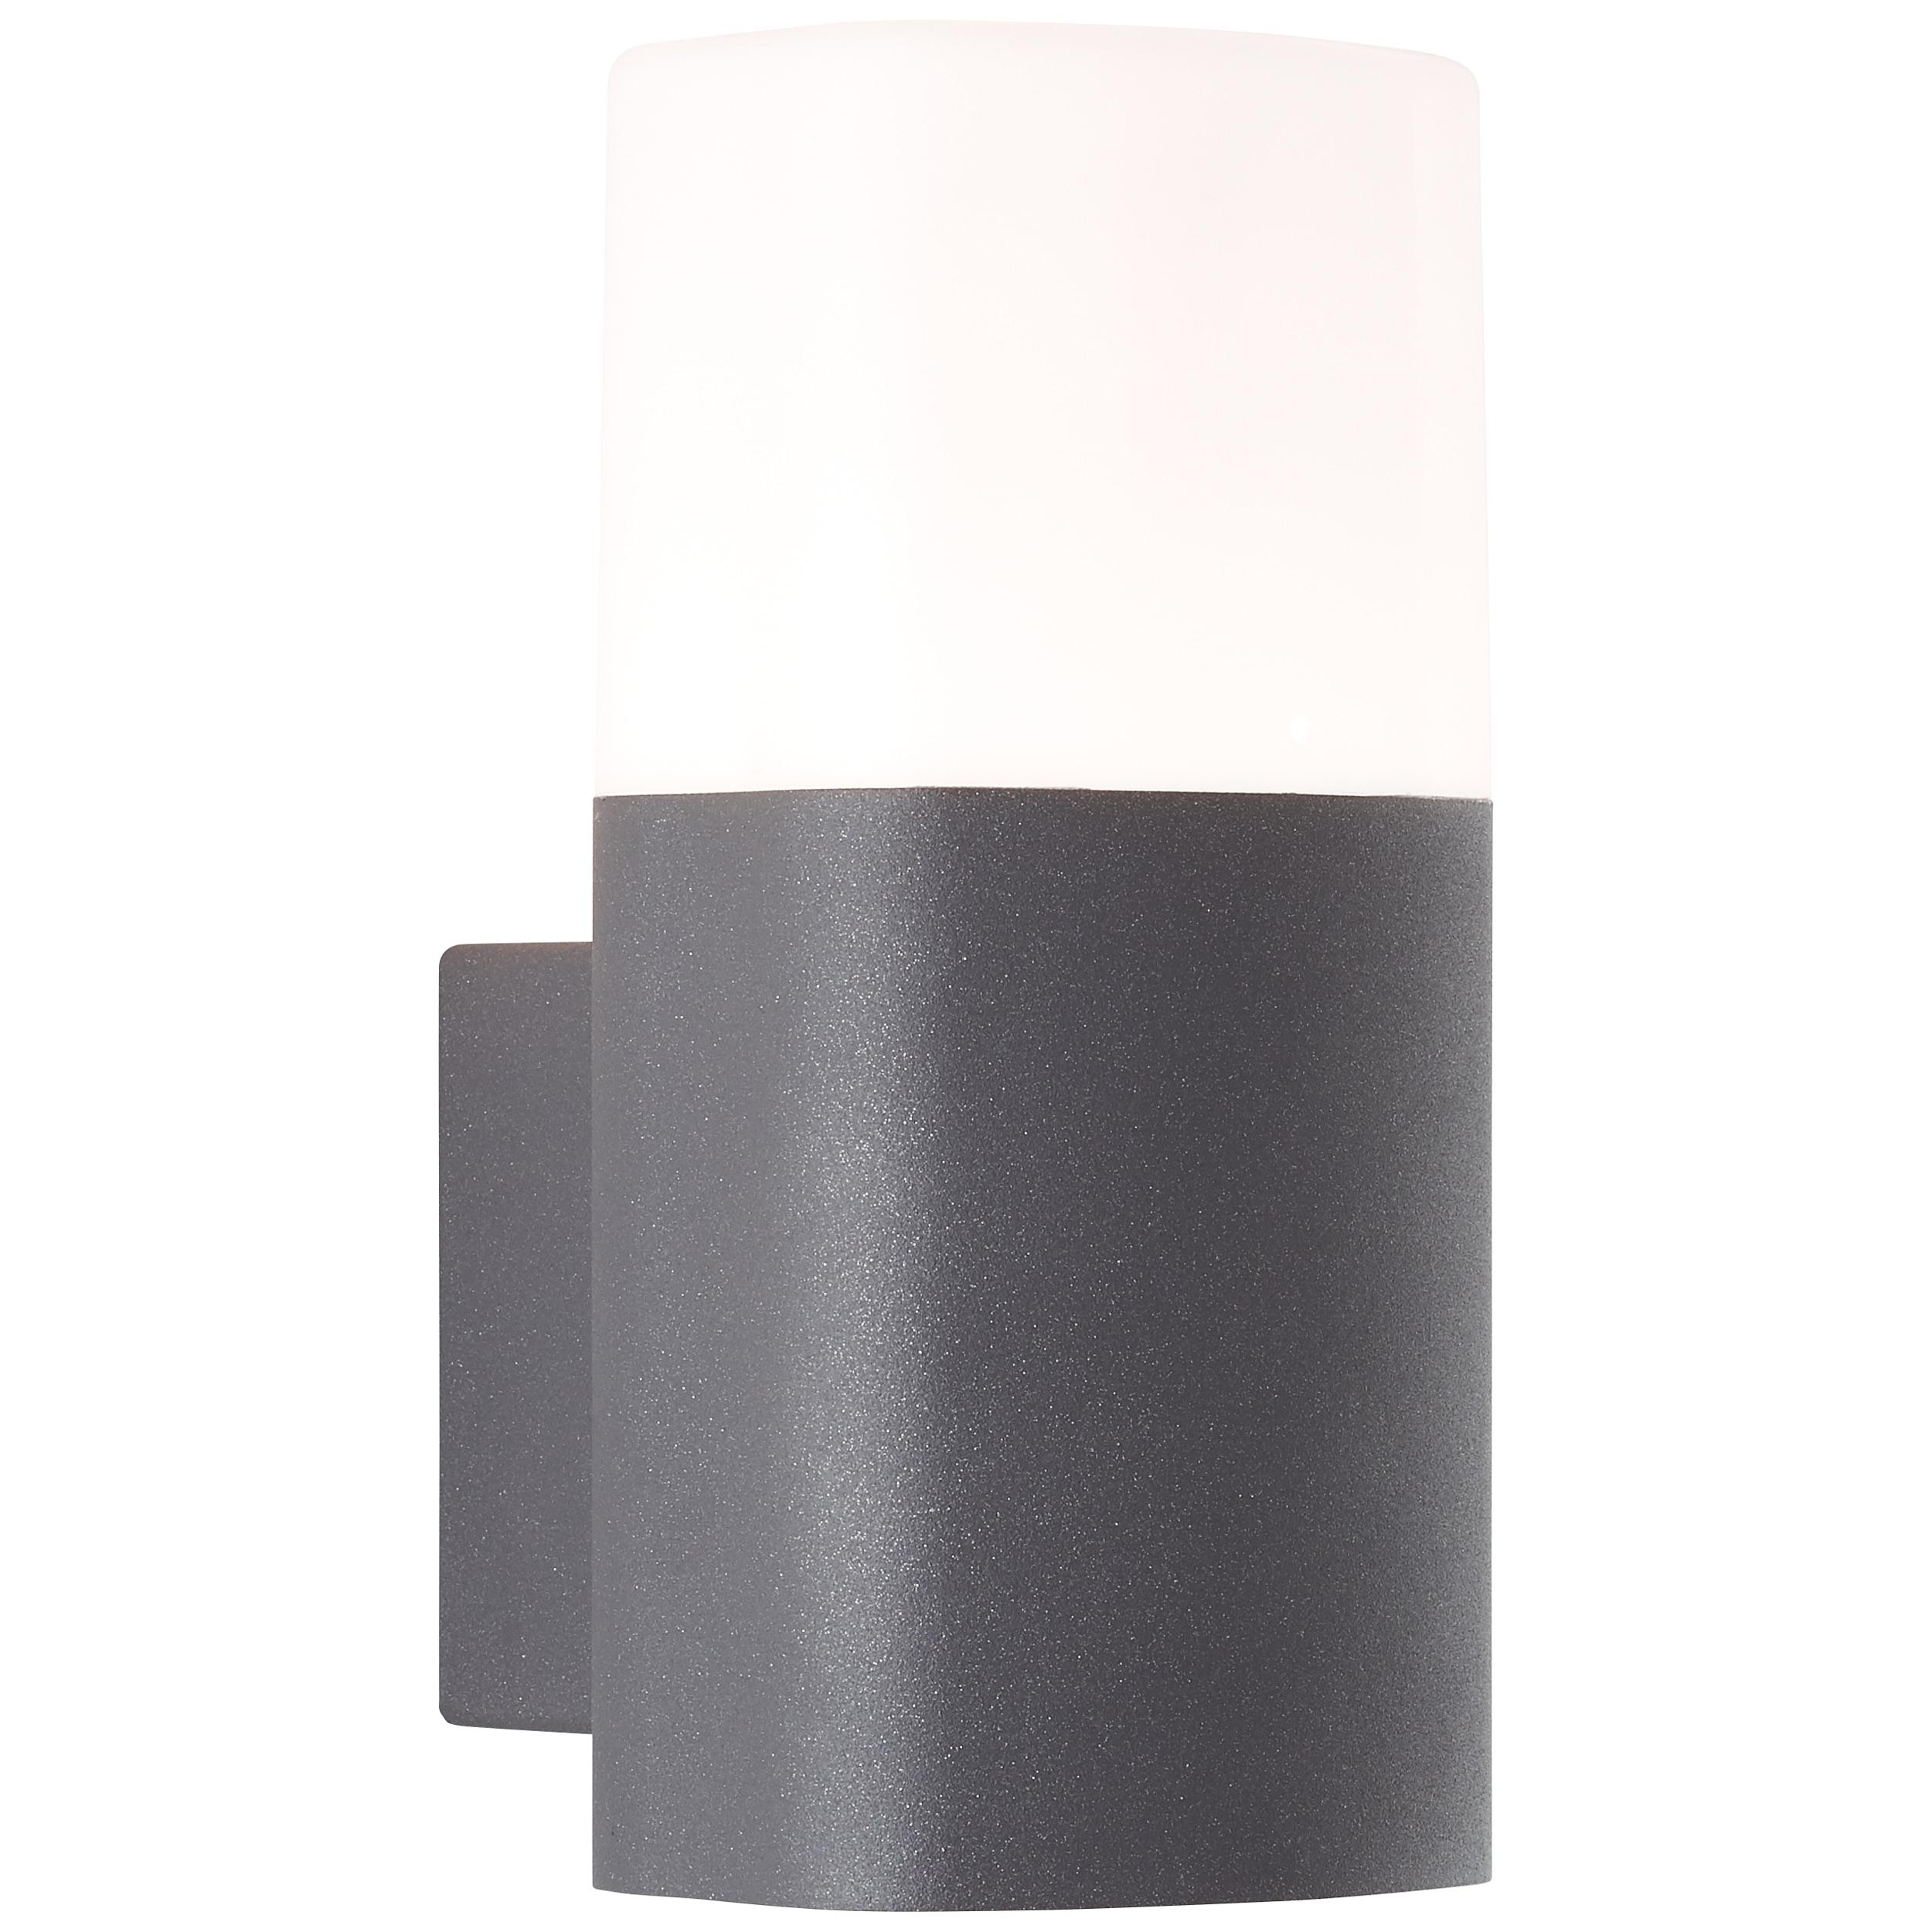 AEG Farlay LED Außenwandleuchte anthrazit